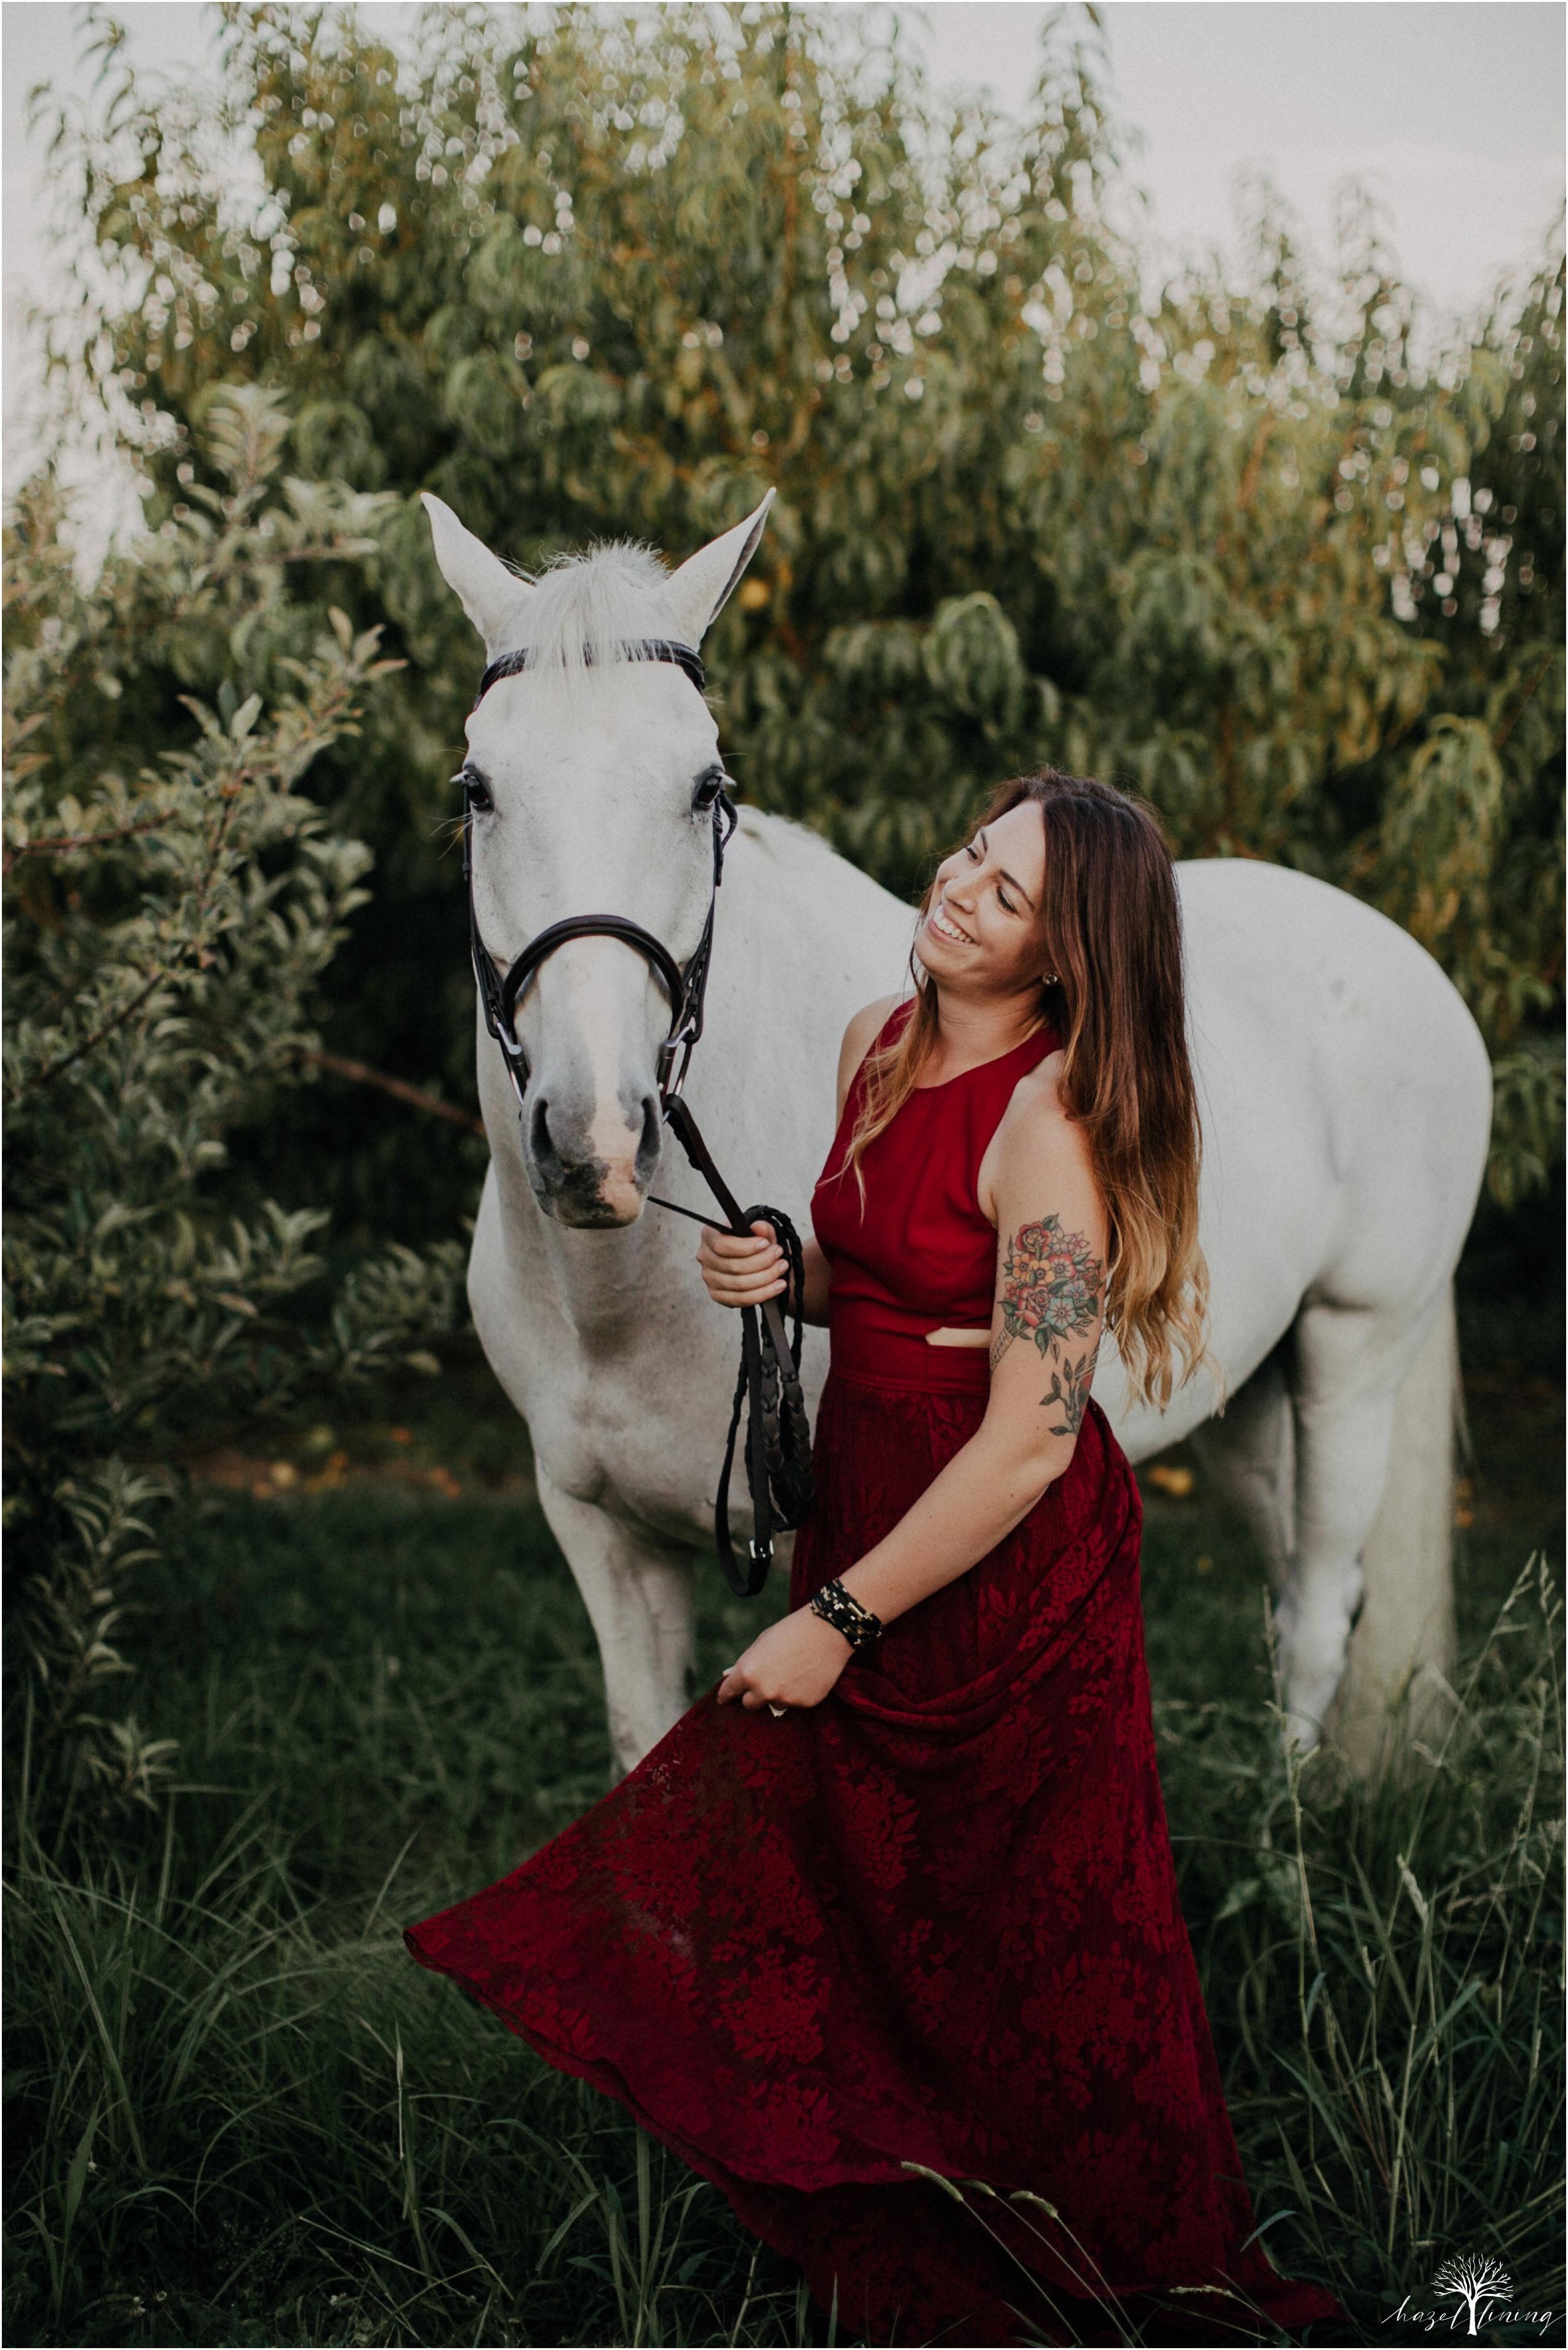 taylor-adams-and-horse-delaware-valley-university-delval-summer-equestrian-portrait-session-hazel-lining-photography-destination-elopement-wedding-engagement-photography_0048.jpg